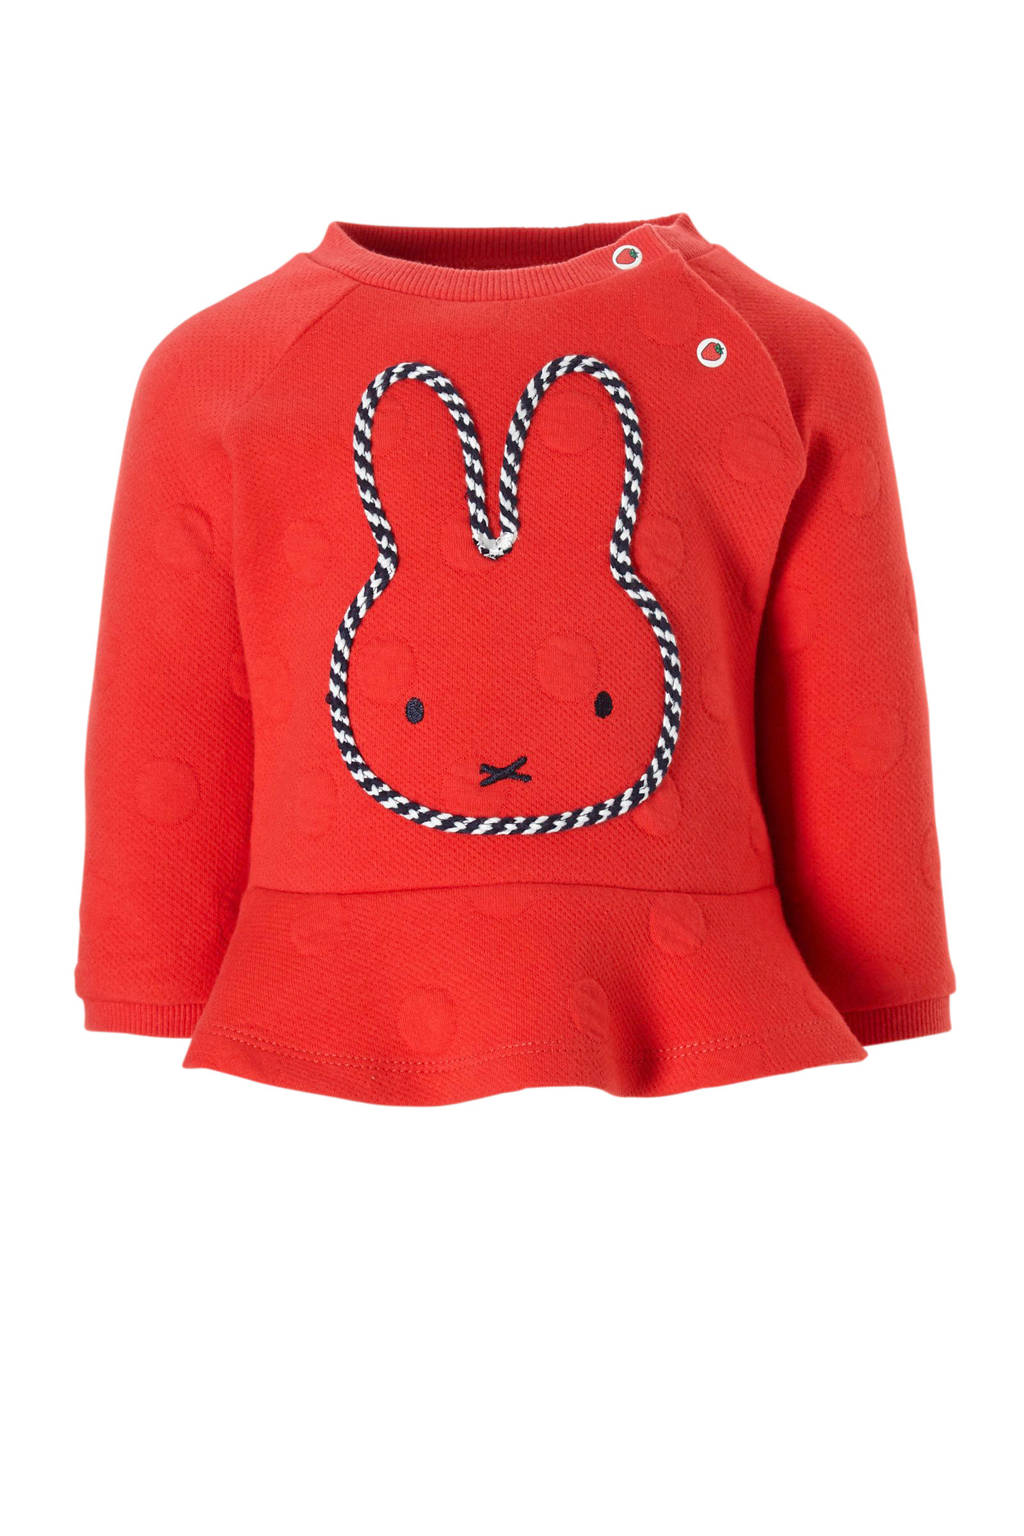 C&A nijntje sweater met stippen rood, Rood